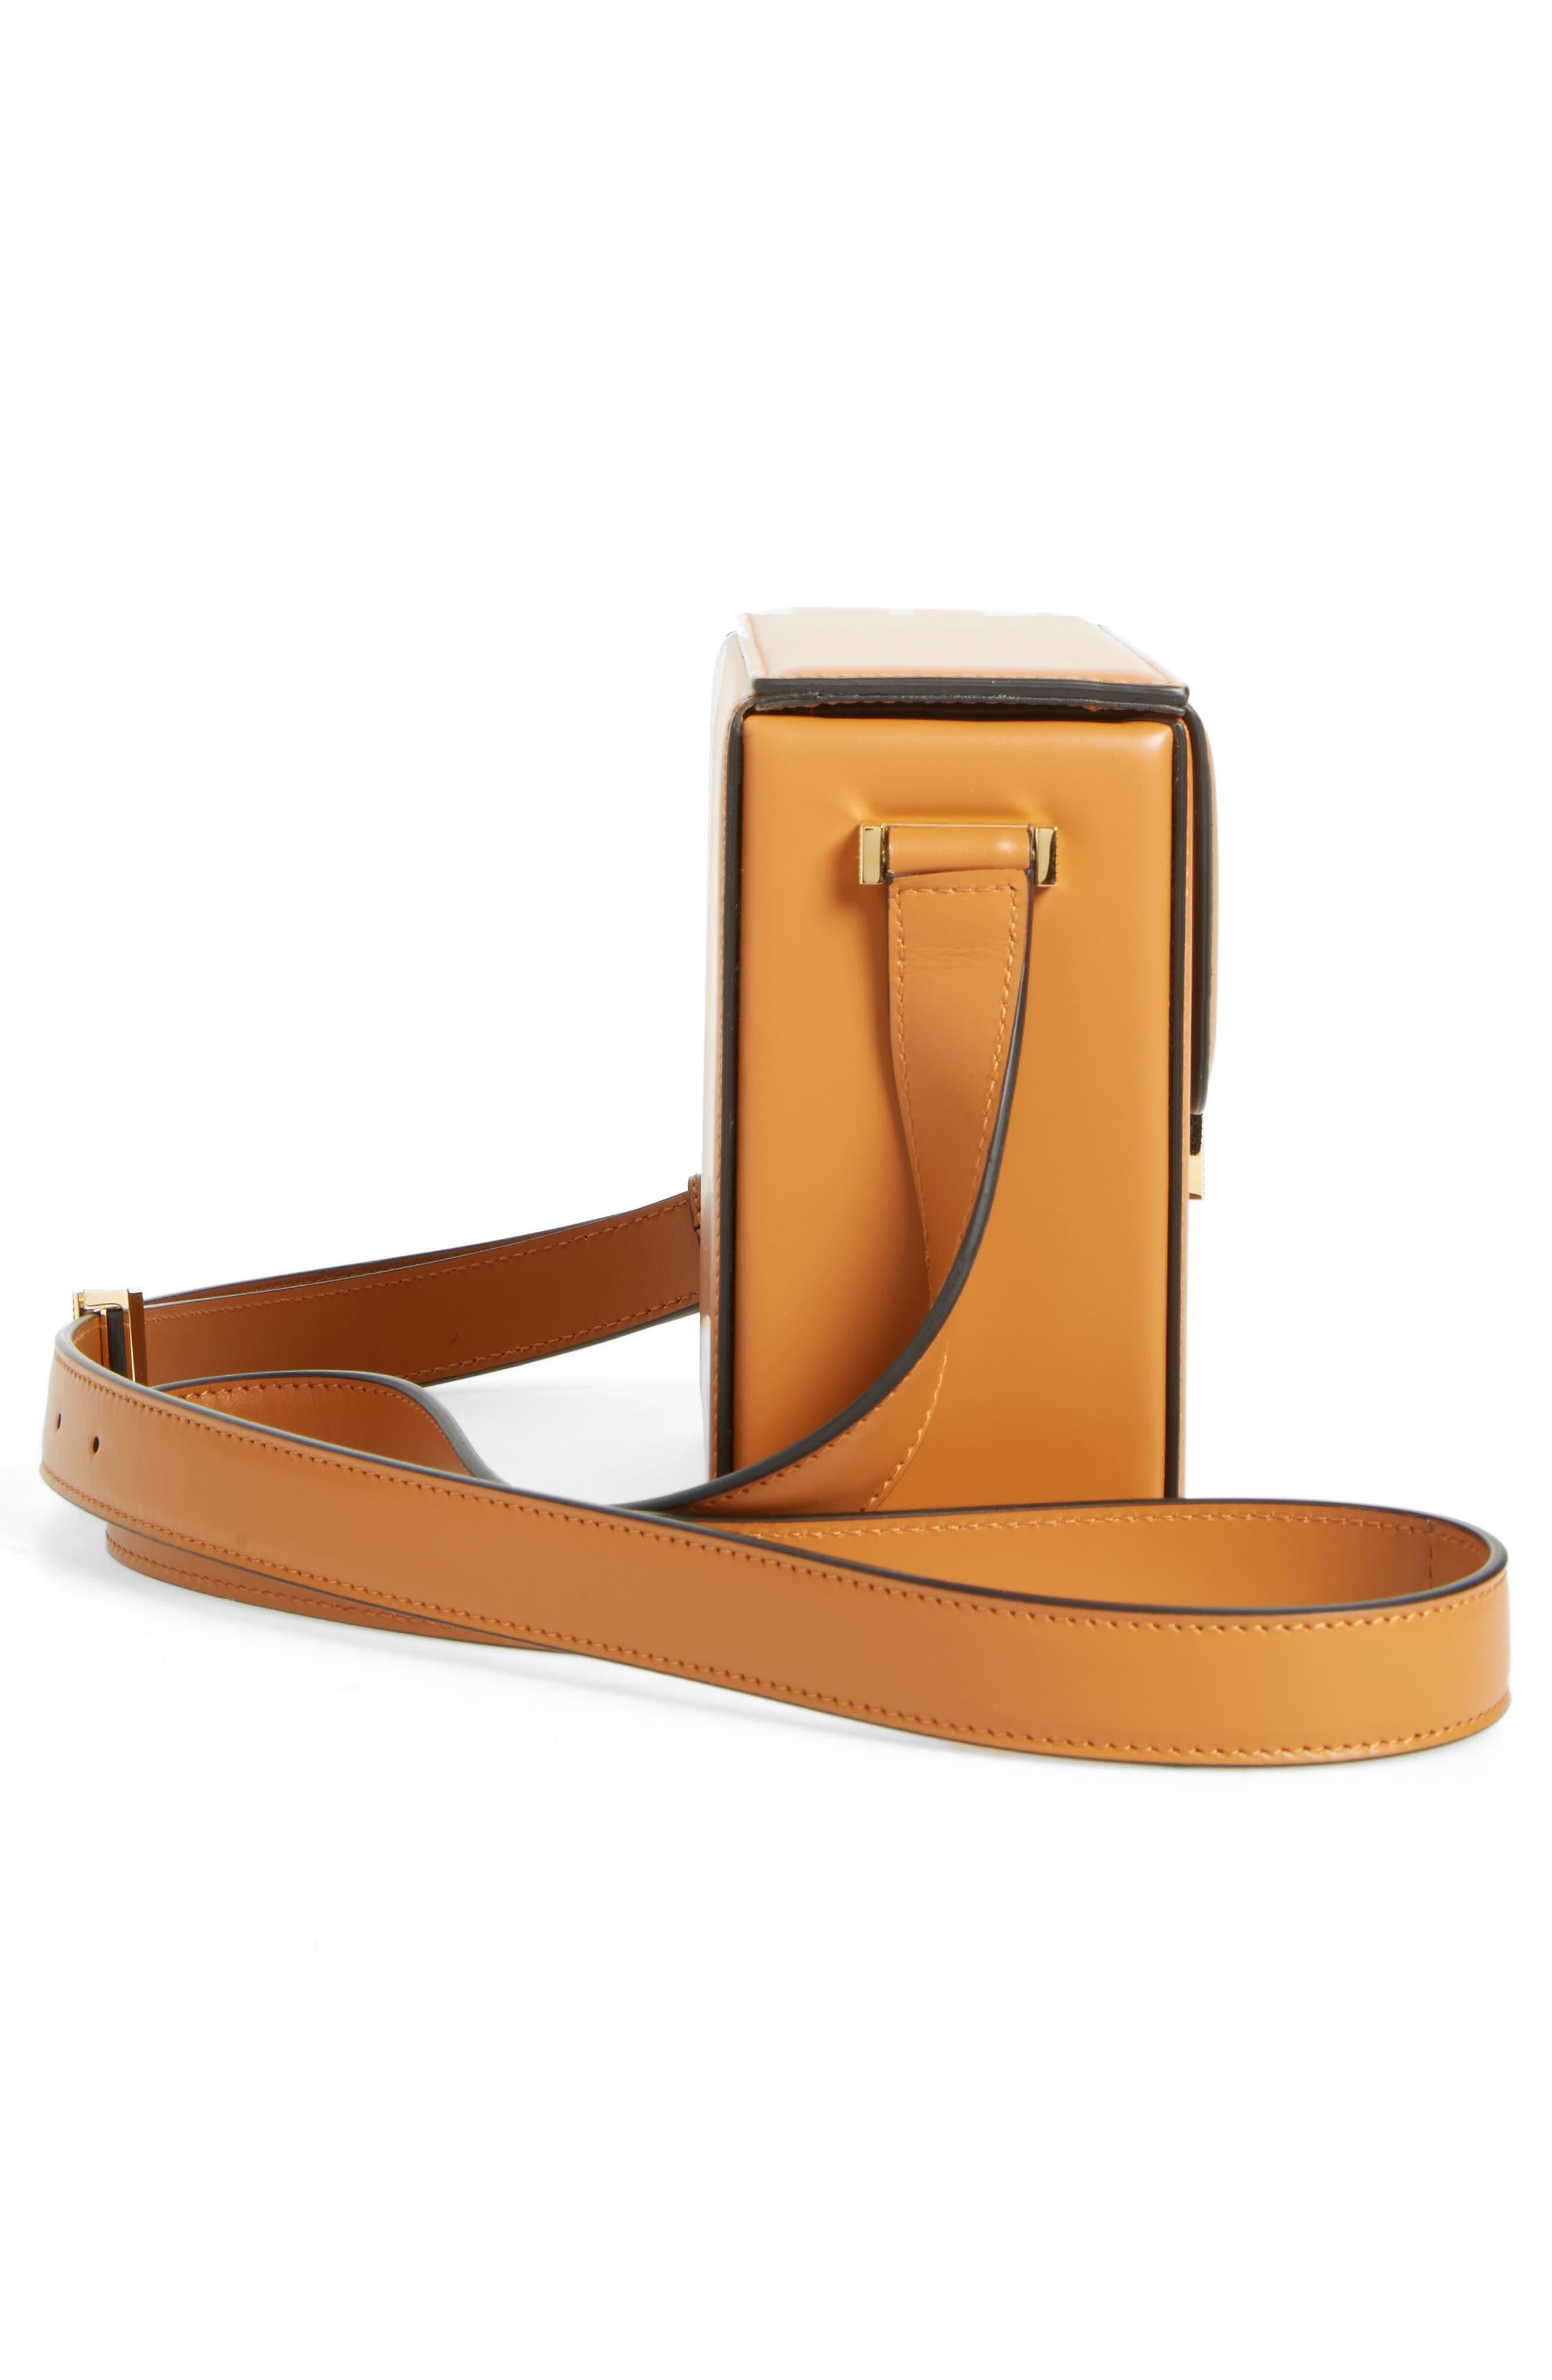 Vanity Calfskin Leather Box Bag,                             Alternate thumbnail 5, color,                             Mustard